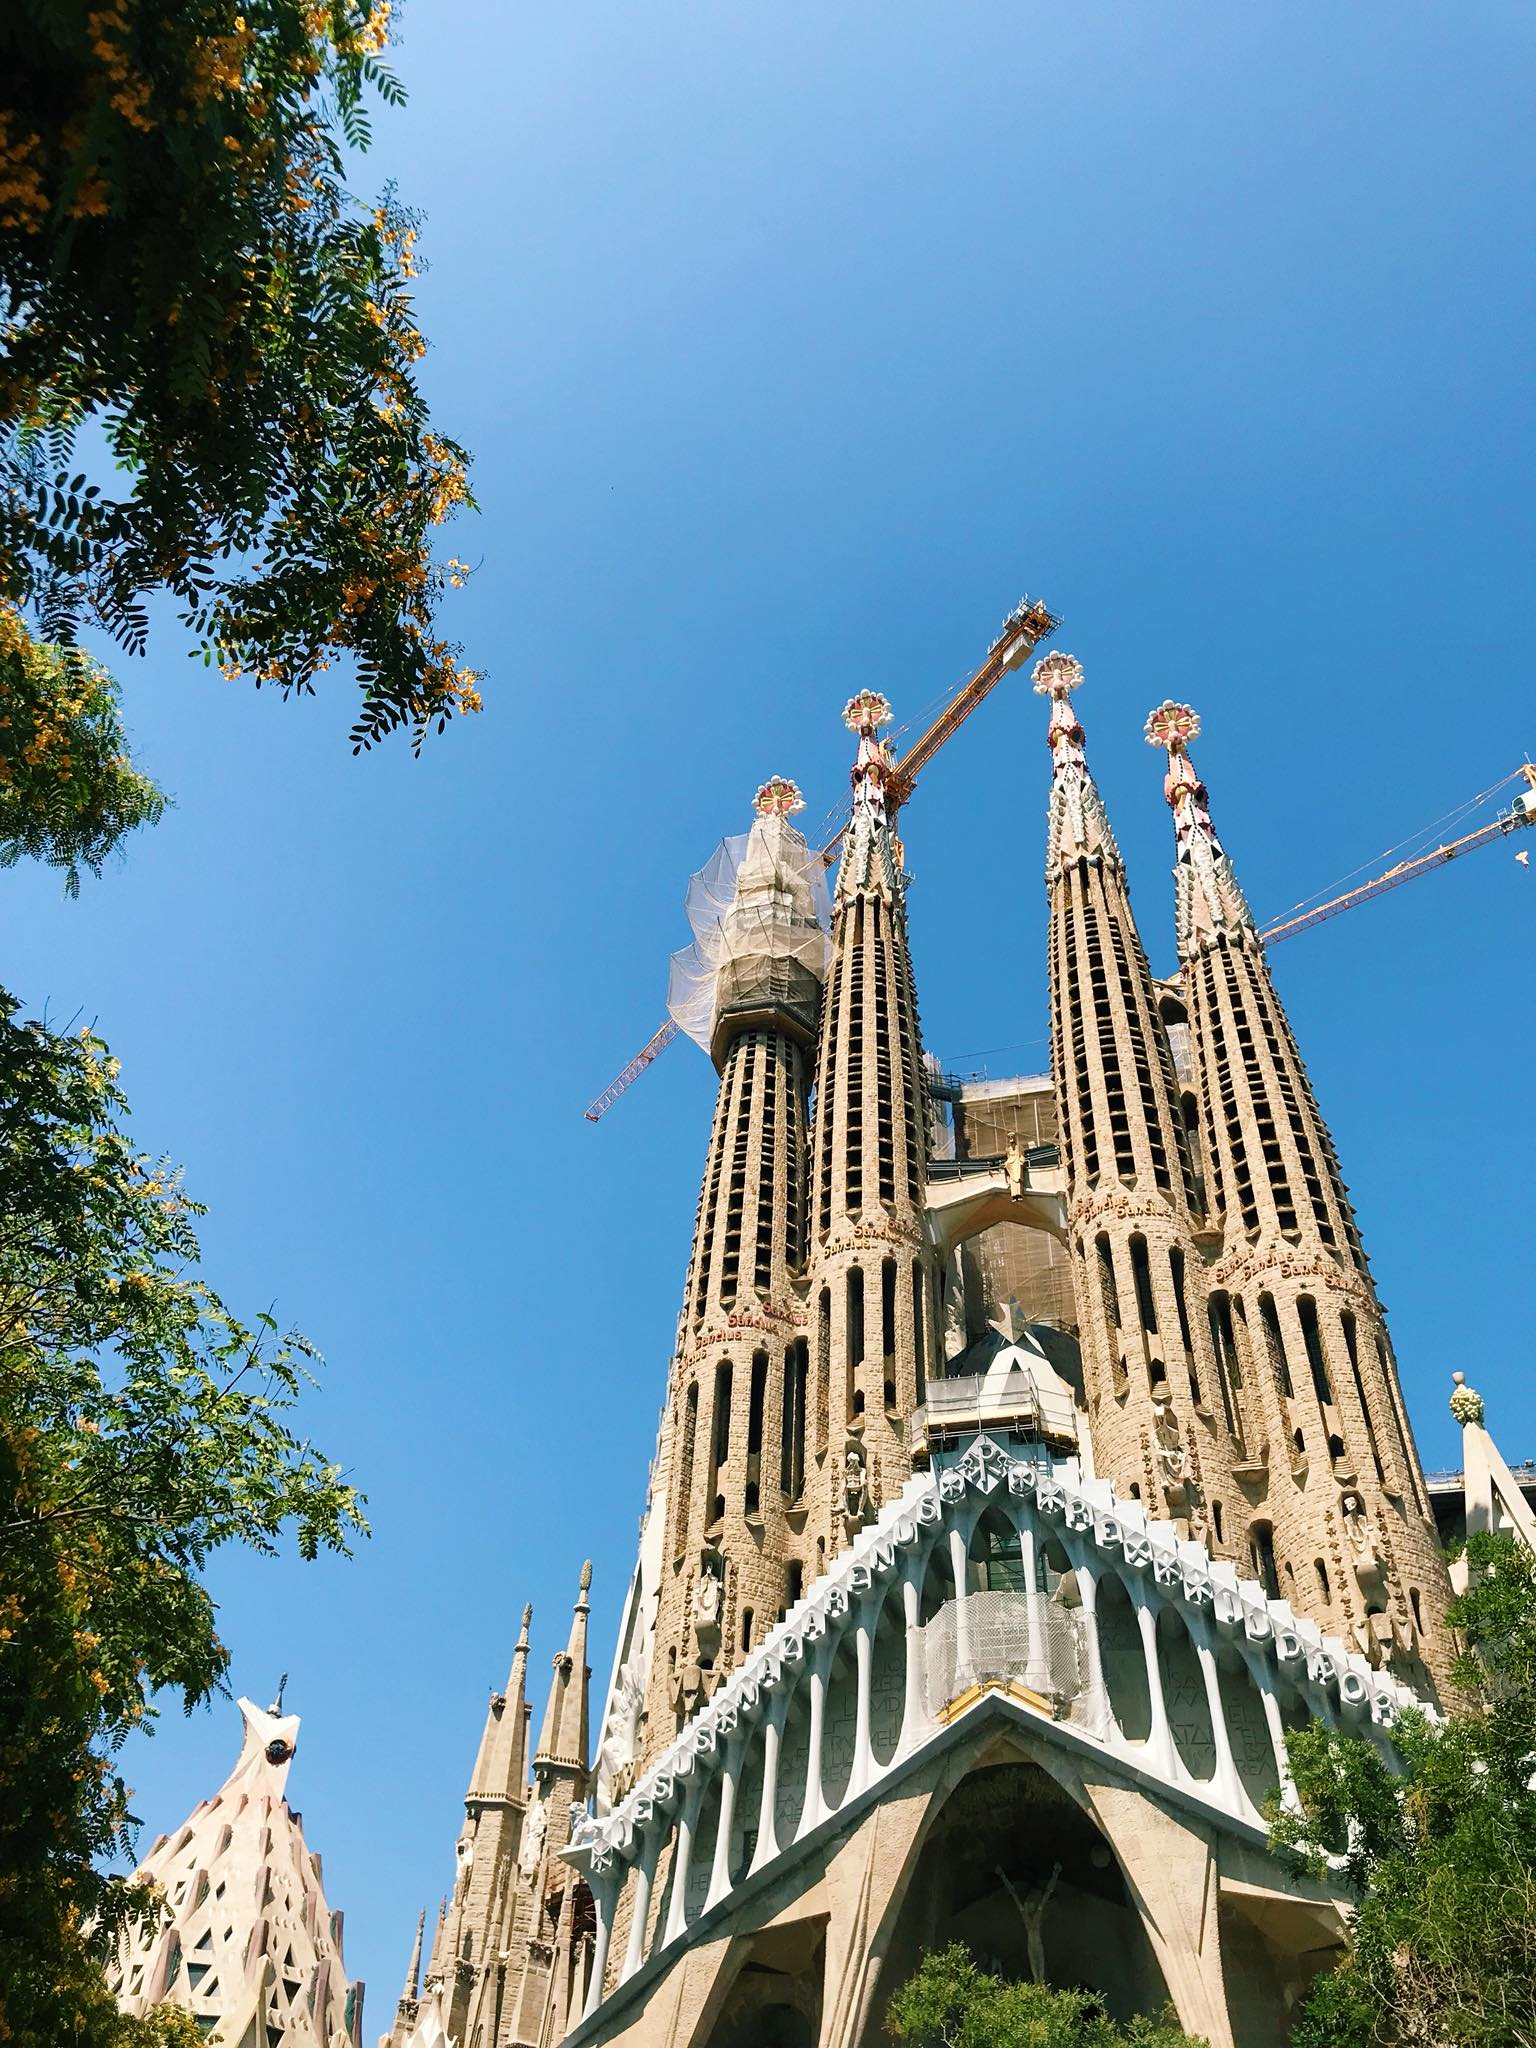 Sagrada Familia exterior, Barcelona